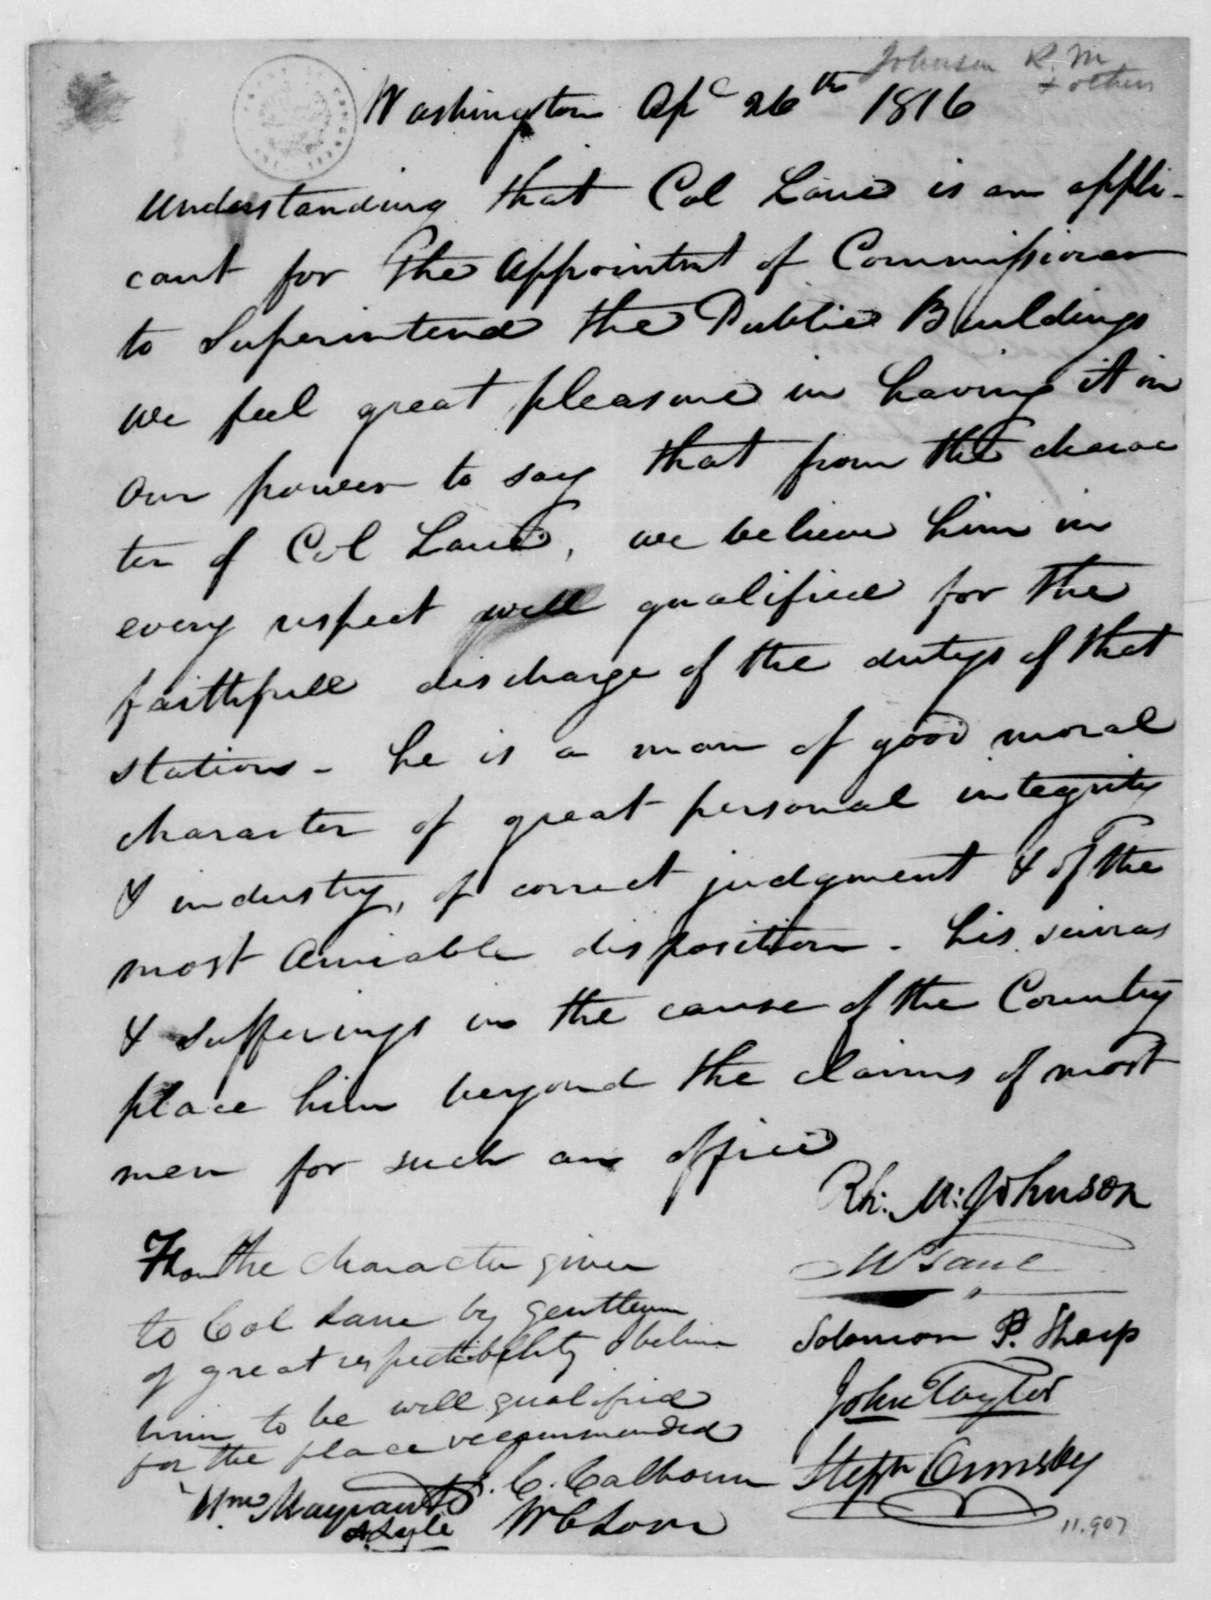 Richard M. Johnson to James Madison, April 26, 1816. Recommendation of Lane.